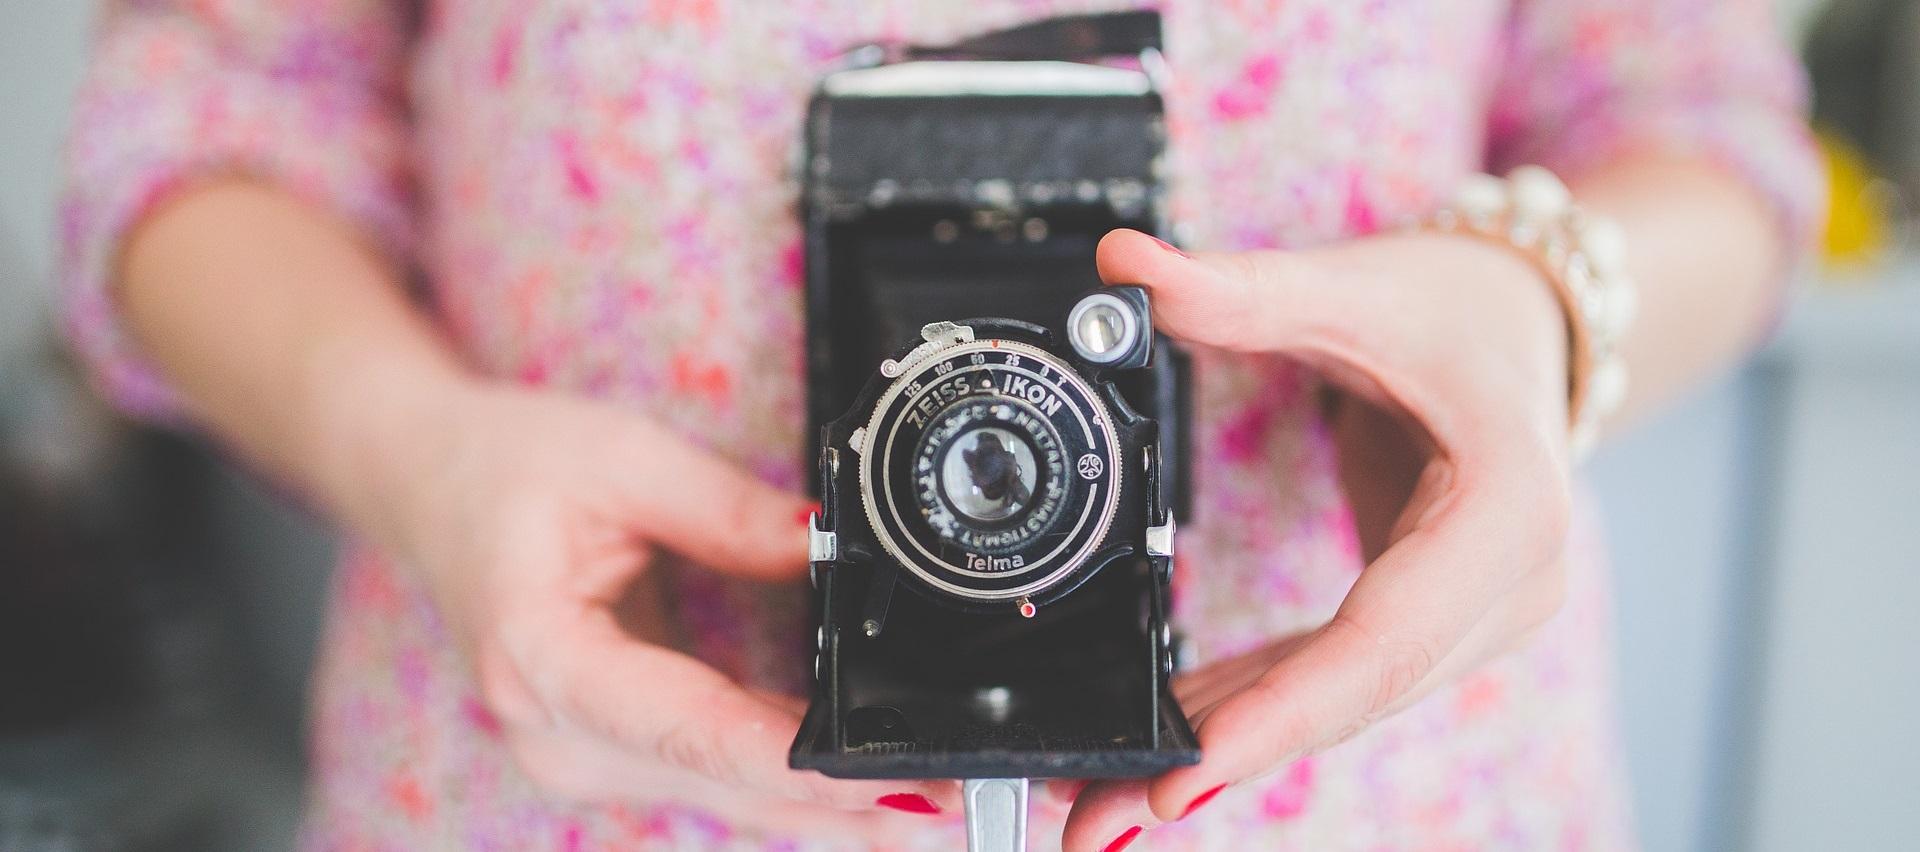 camera-791151_1920